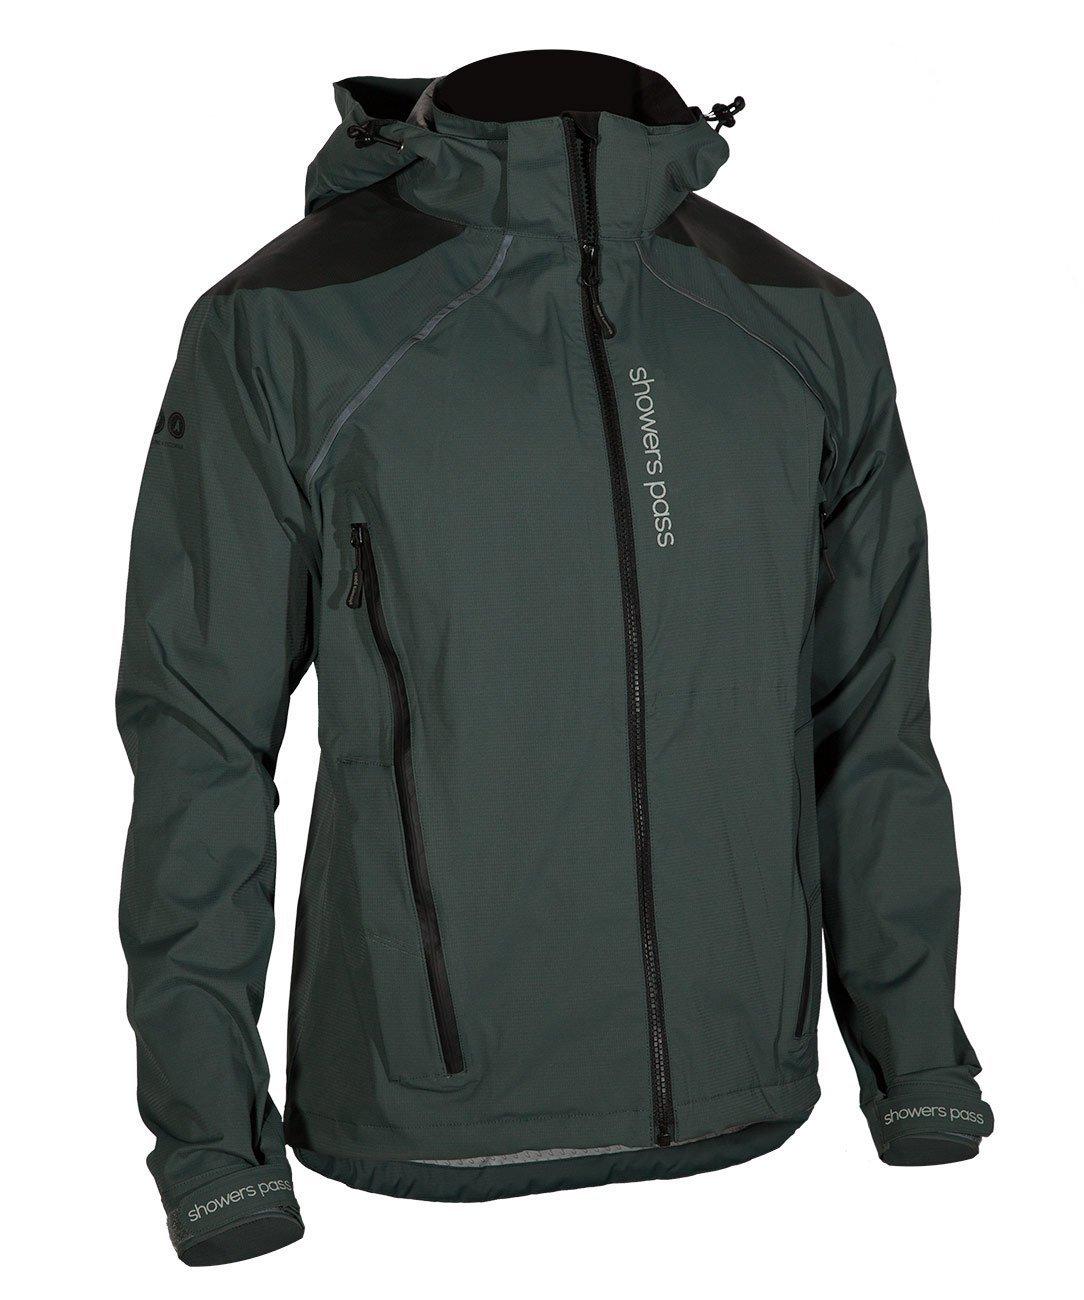 Showers Pass Men's IMBA Waterproof/Breathable Hard Shell Cycling Jacket